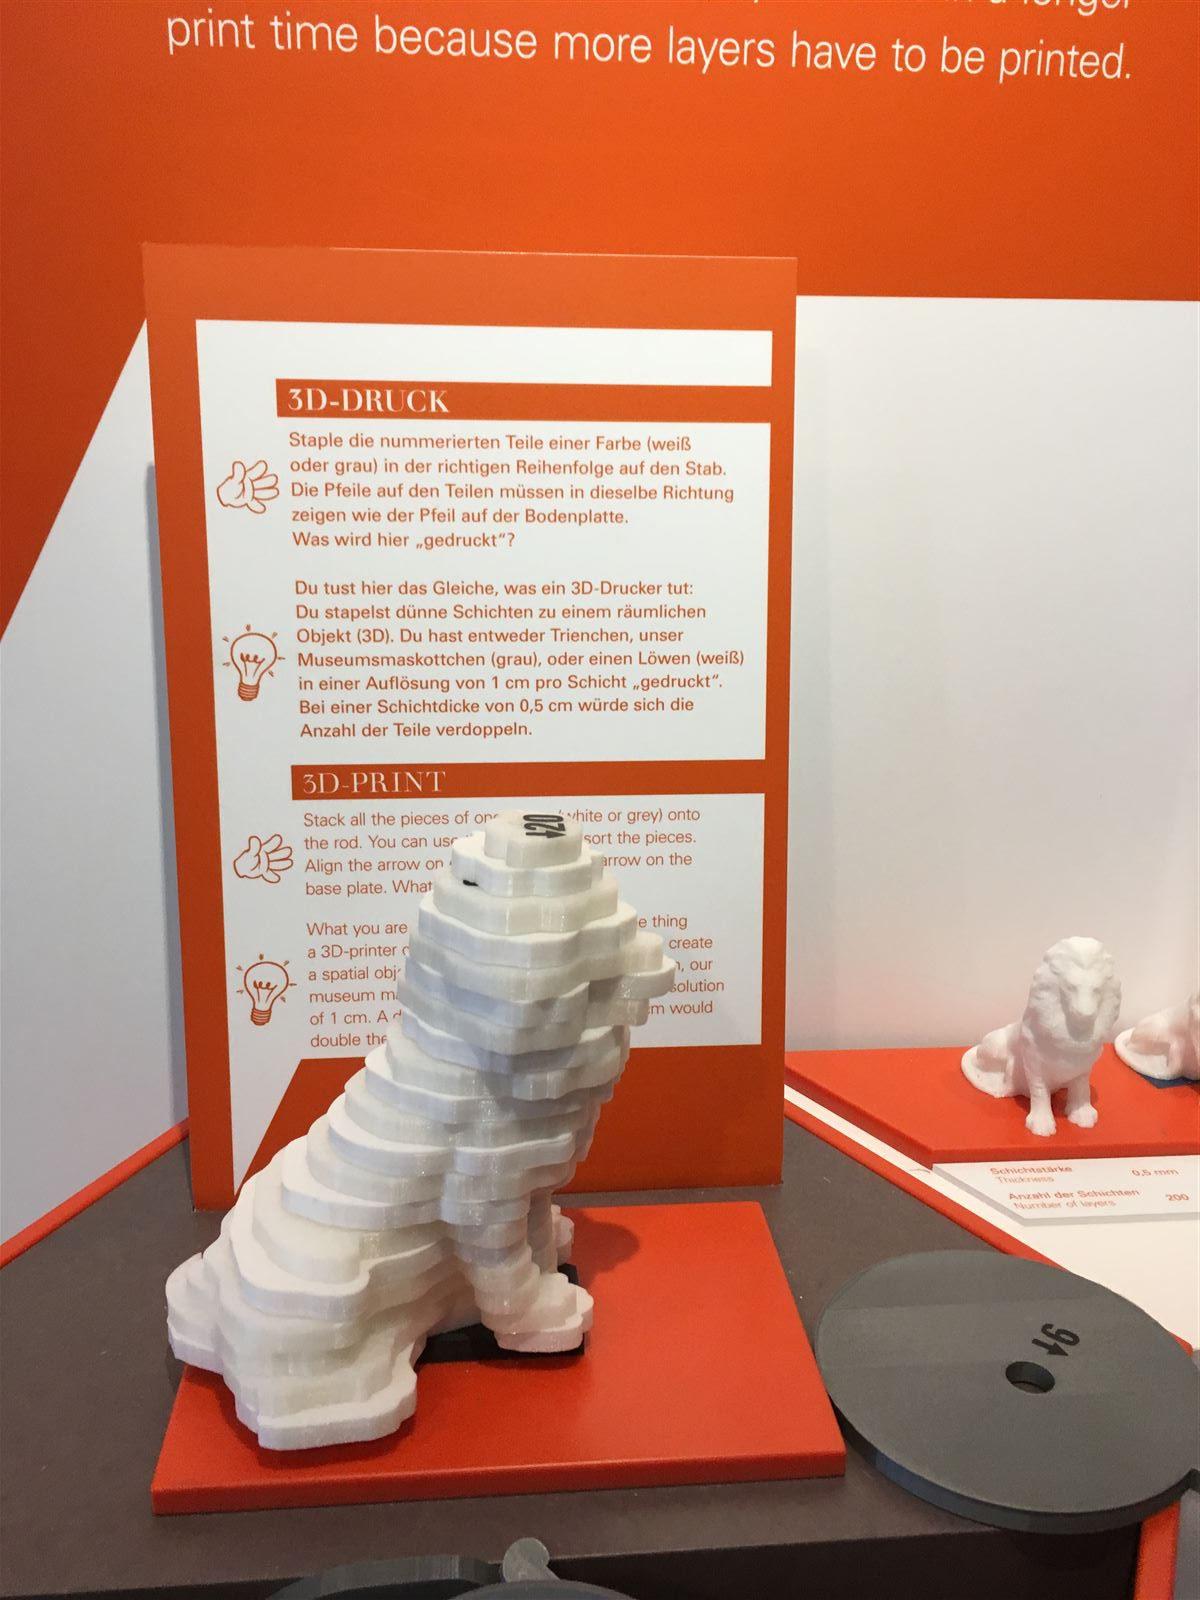 Porzellanikon Selb - Museum für Porzellan in Bayern